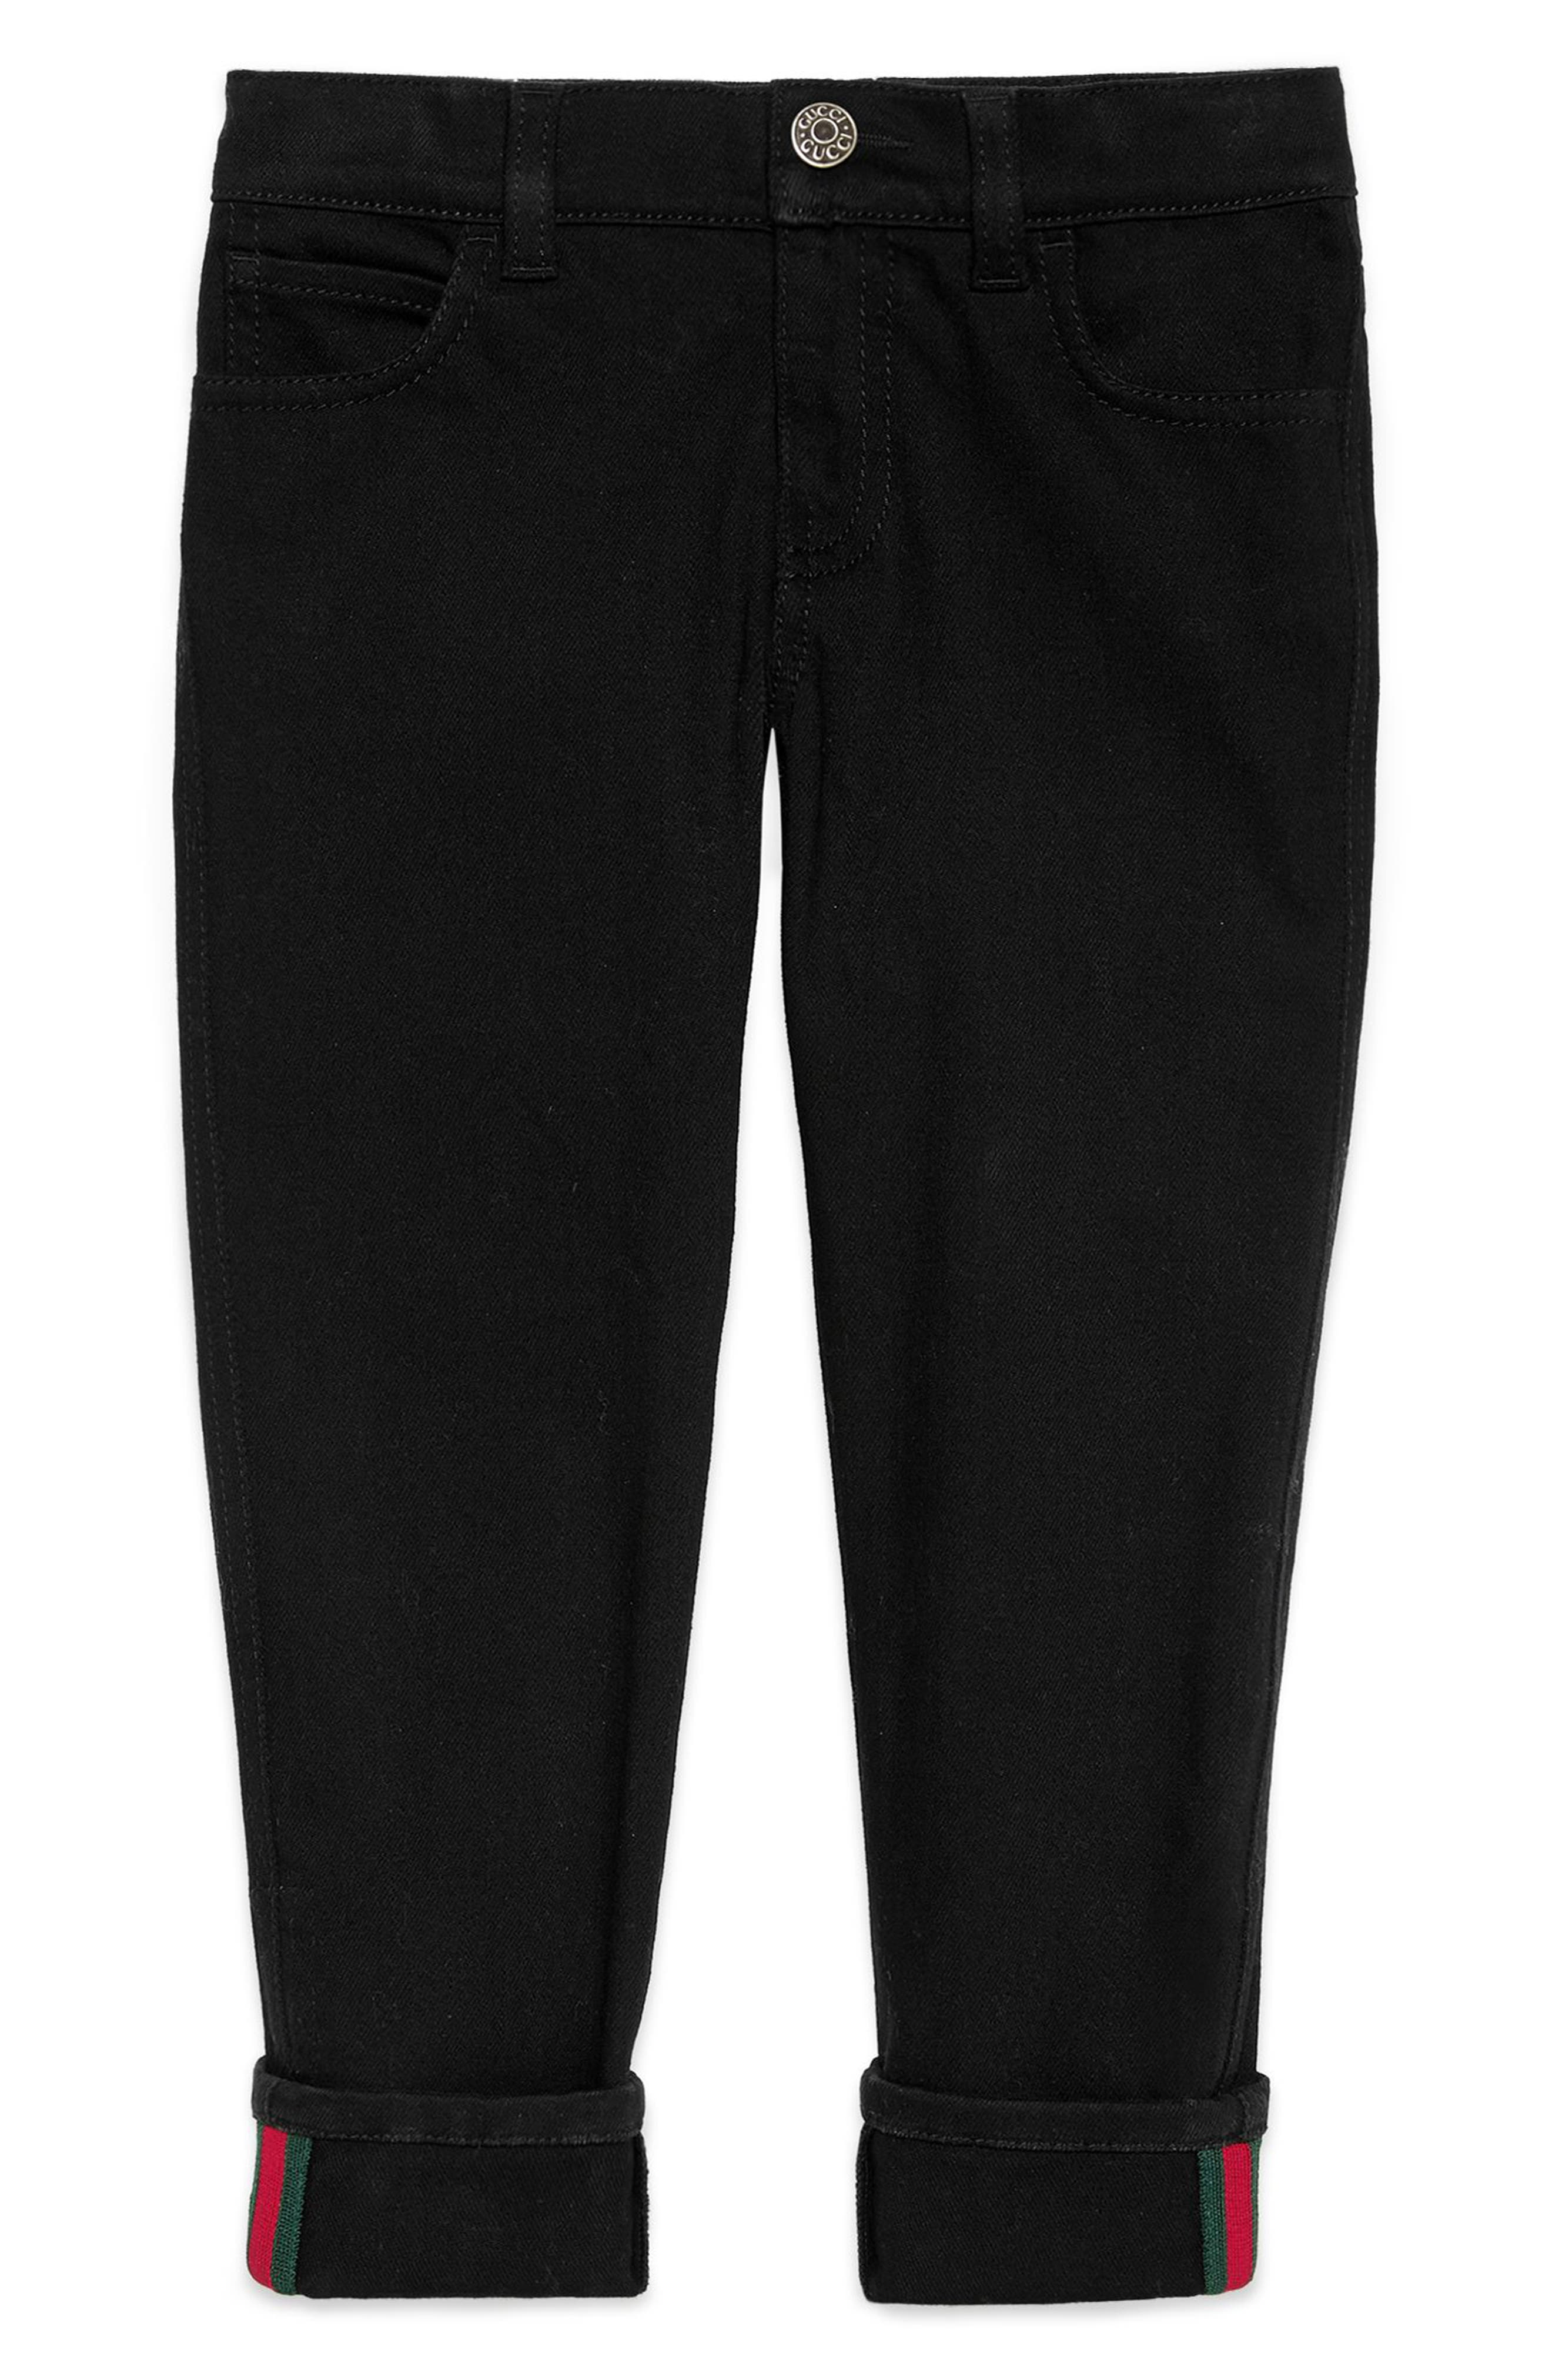 Straight Leg Pants,                             Main thumbnail 1, color,                             BLACK/ GREEN/ RED